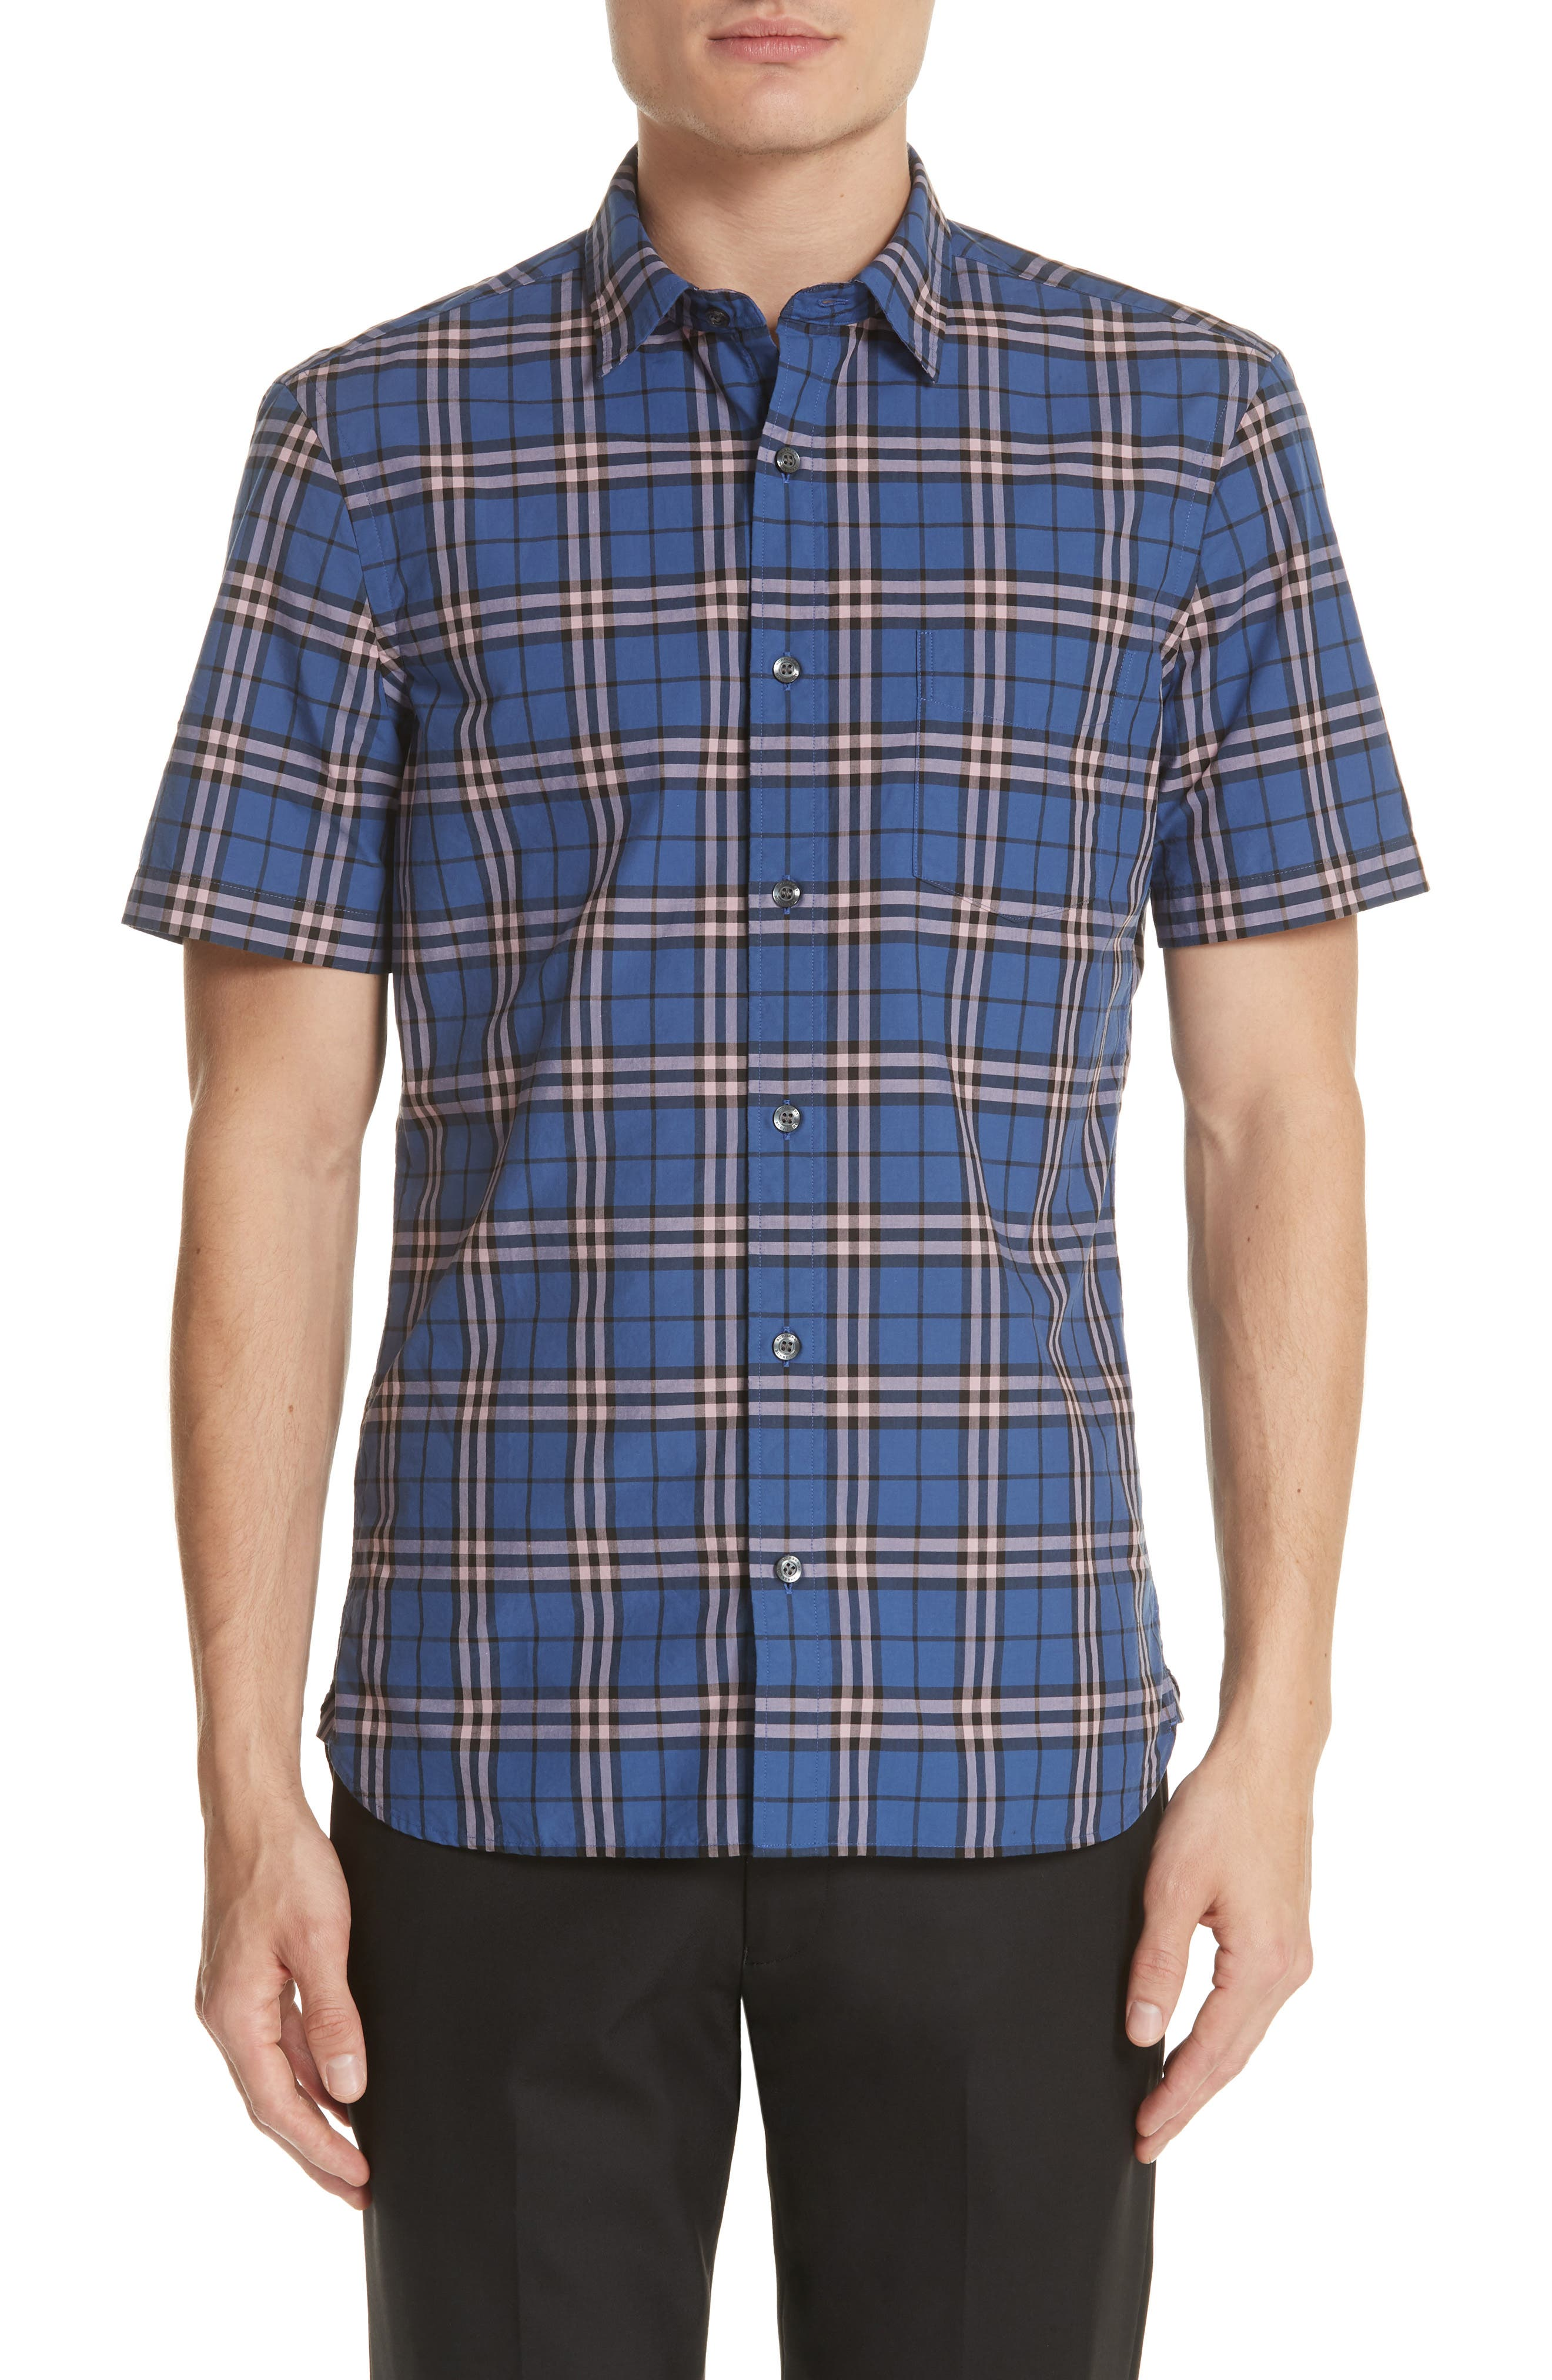 Alexander Check Shirt,                         Main,                         color, 409